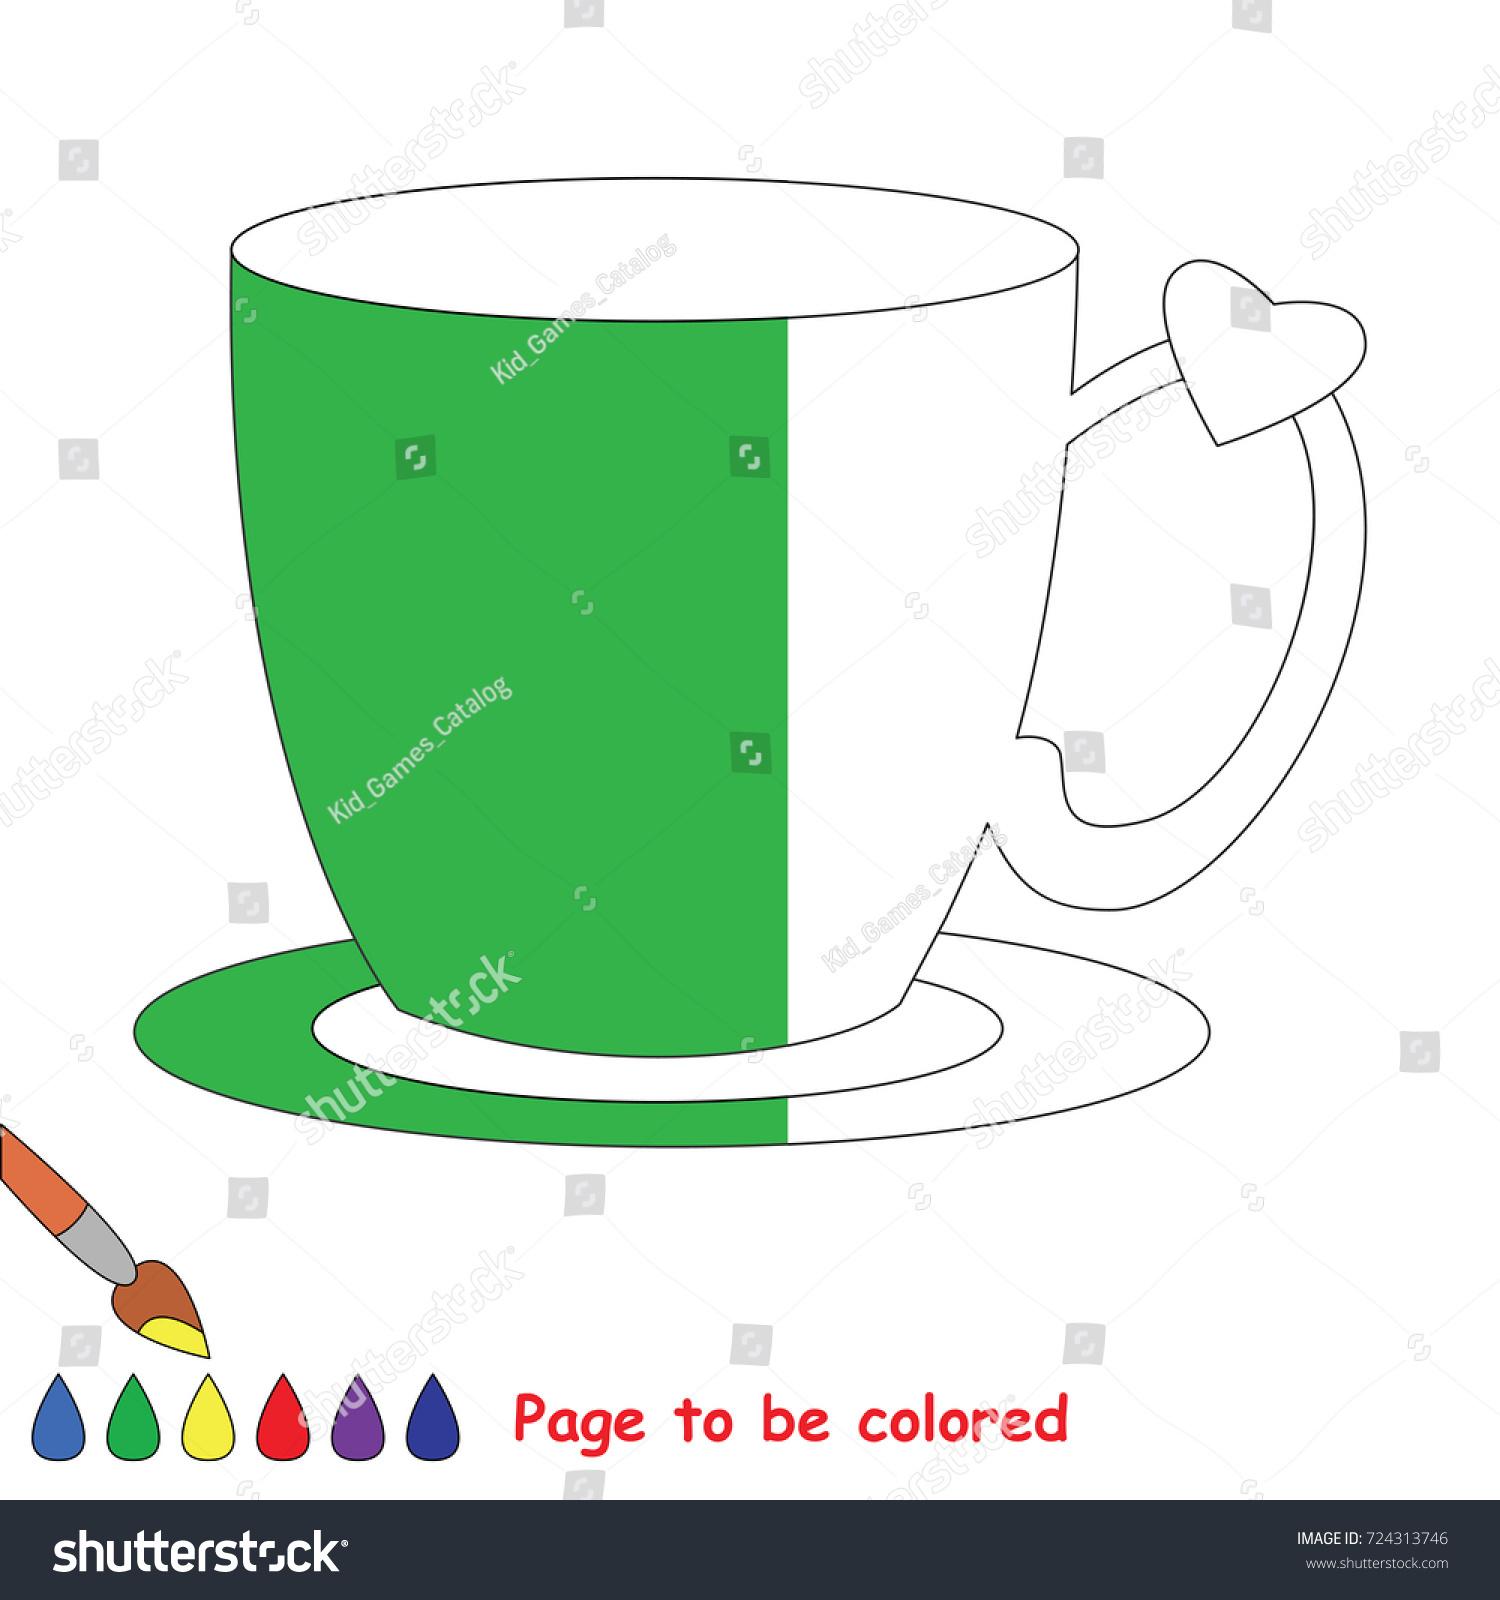 Tea Pair Cup Coloring Book Educate Stock Vector HD (Royalty Free ...